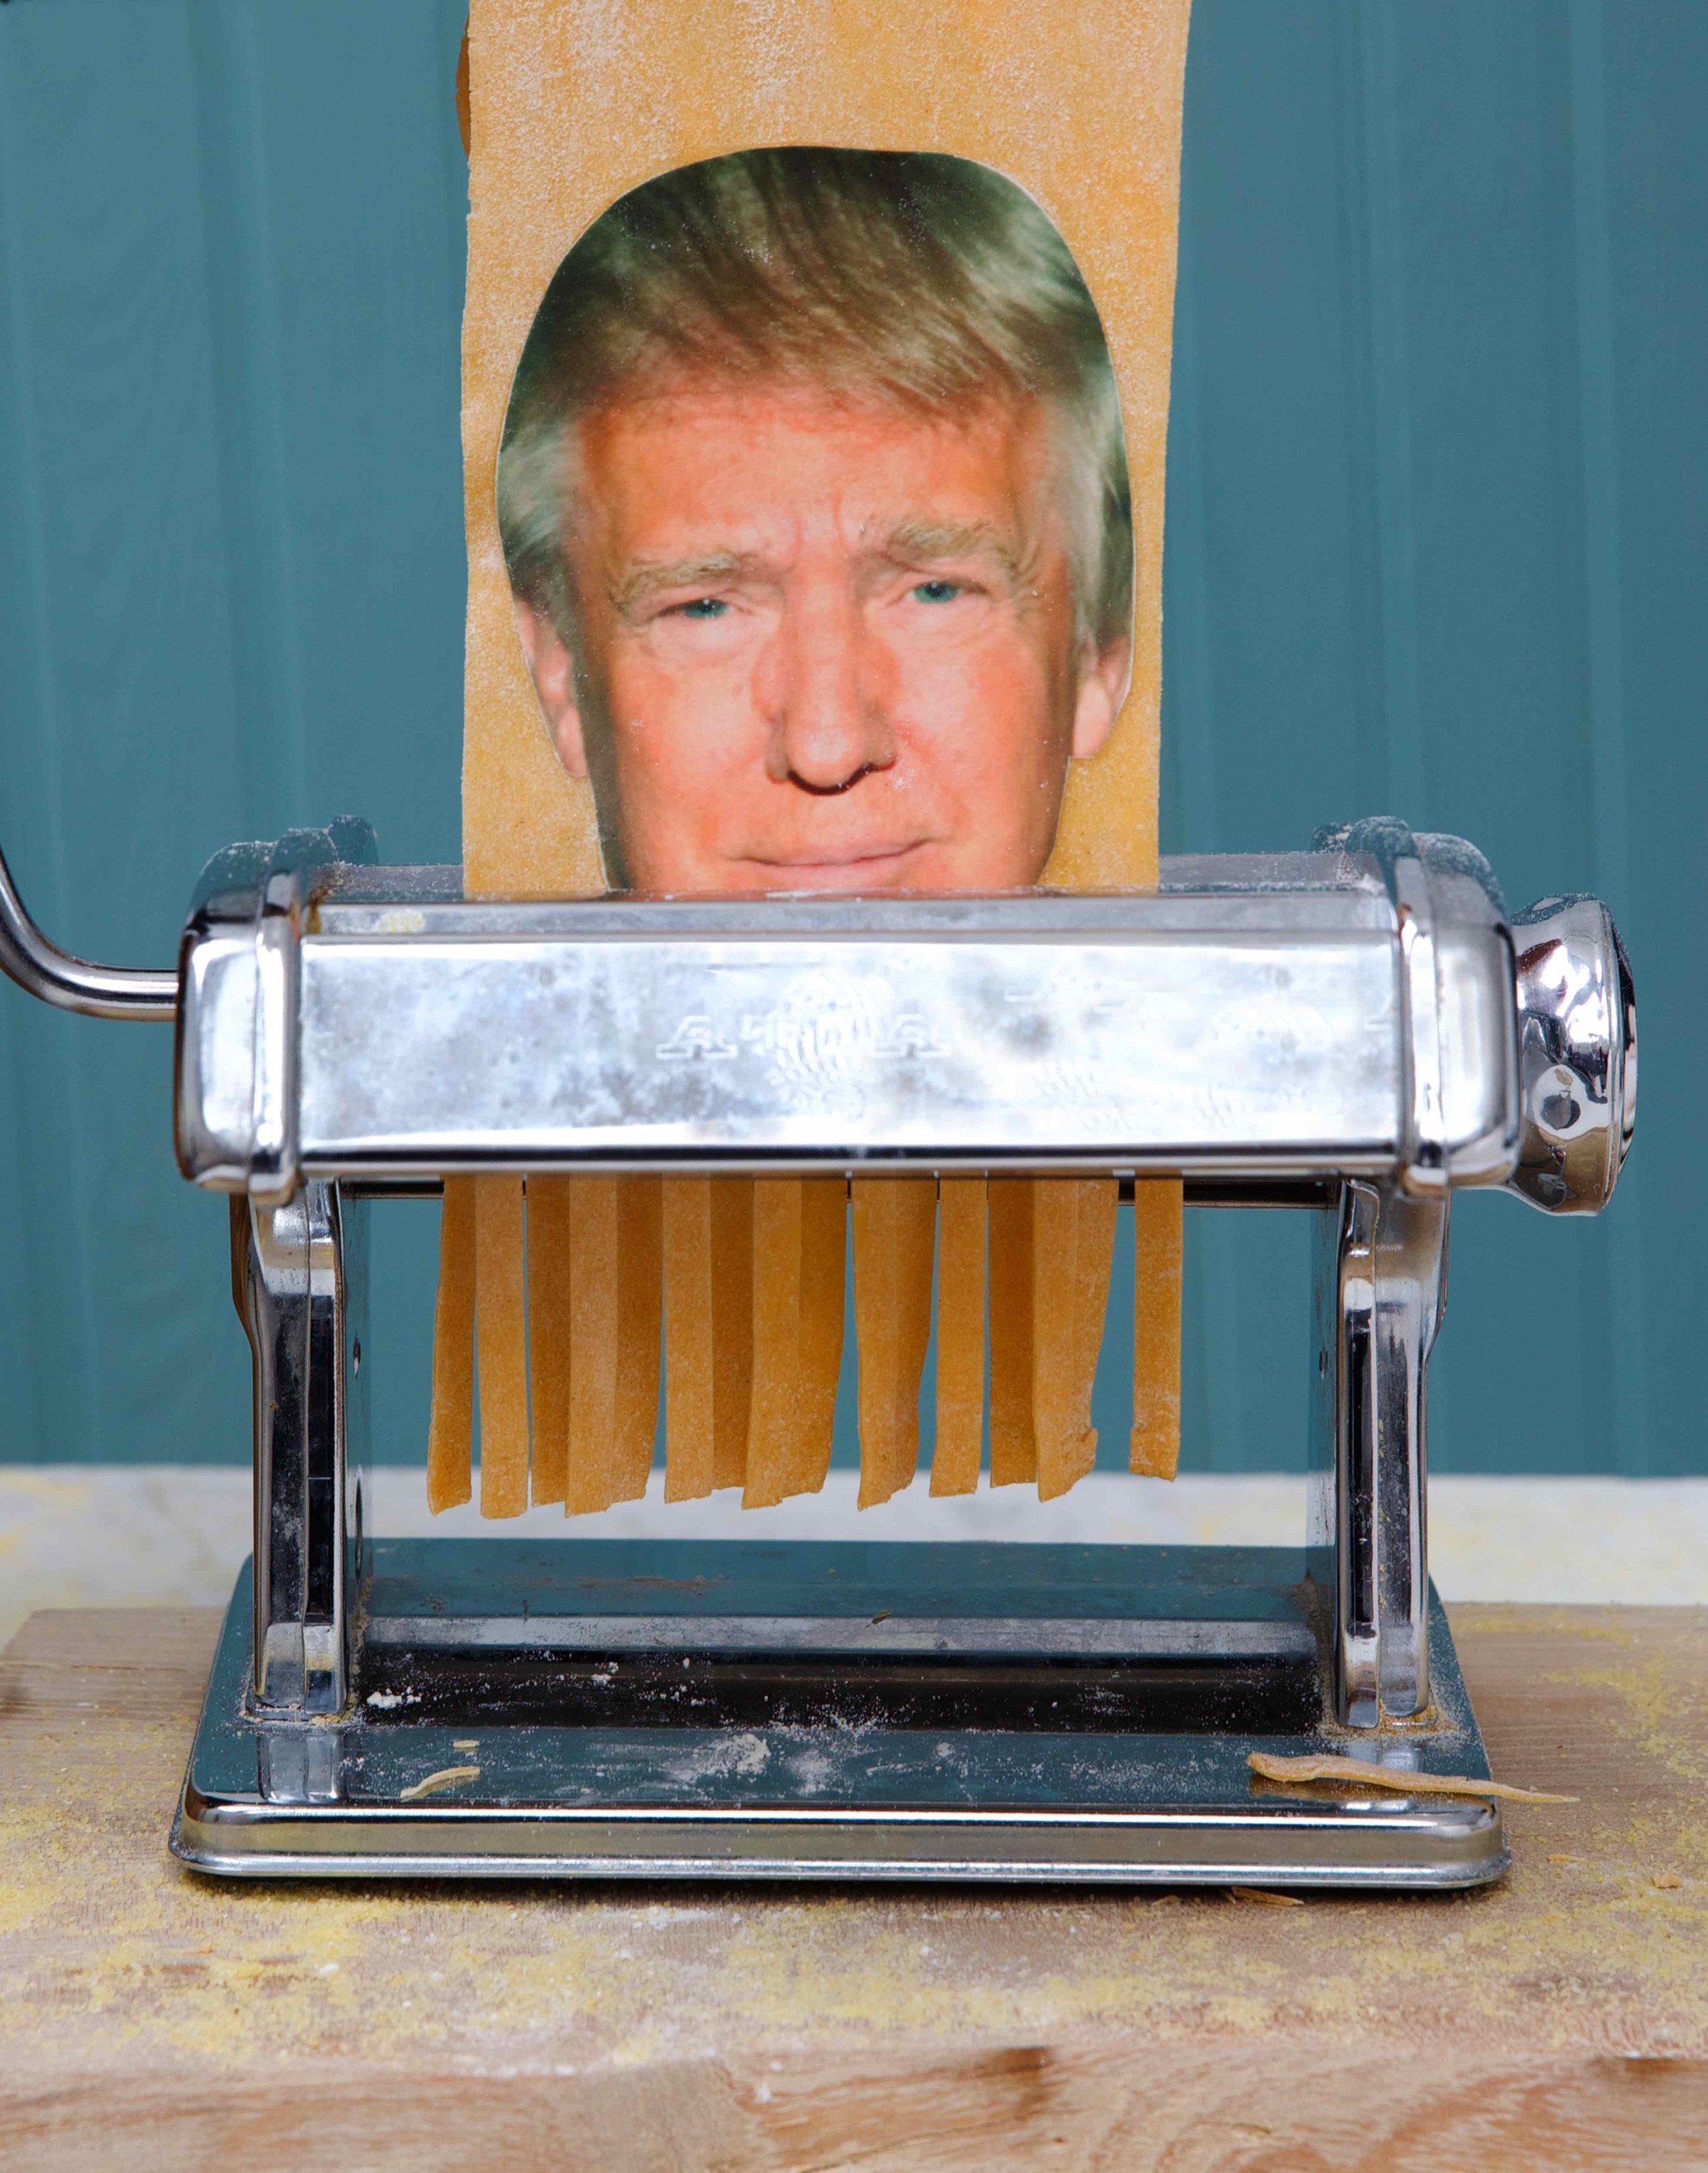 Trump for shredding